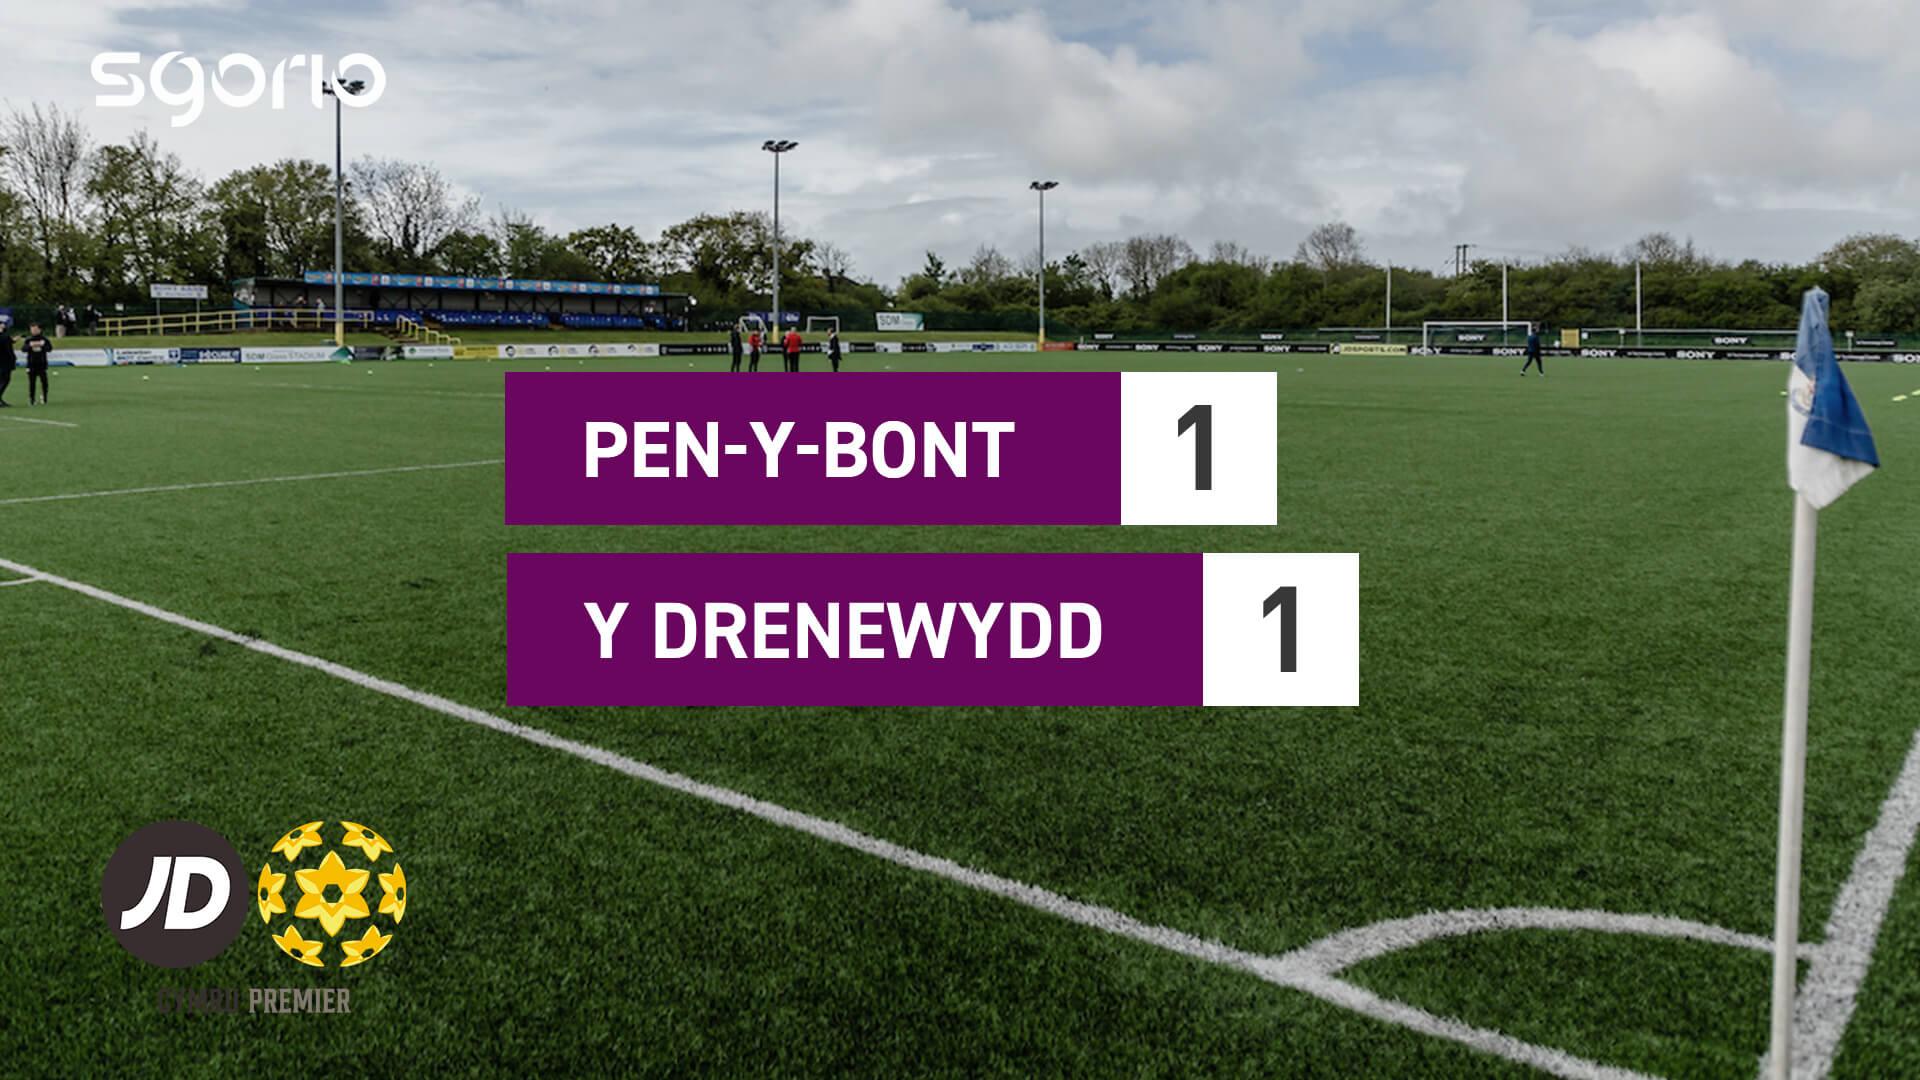 Pen-y-bont 1-1 Y Drenewydd